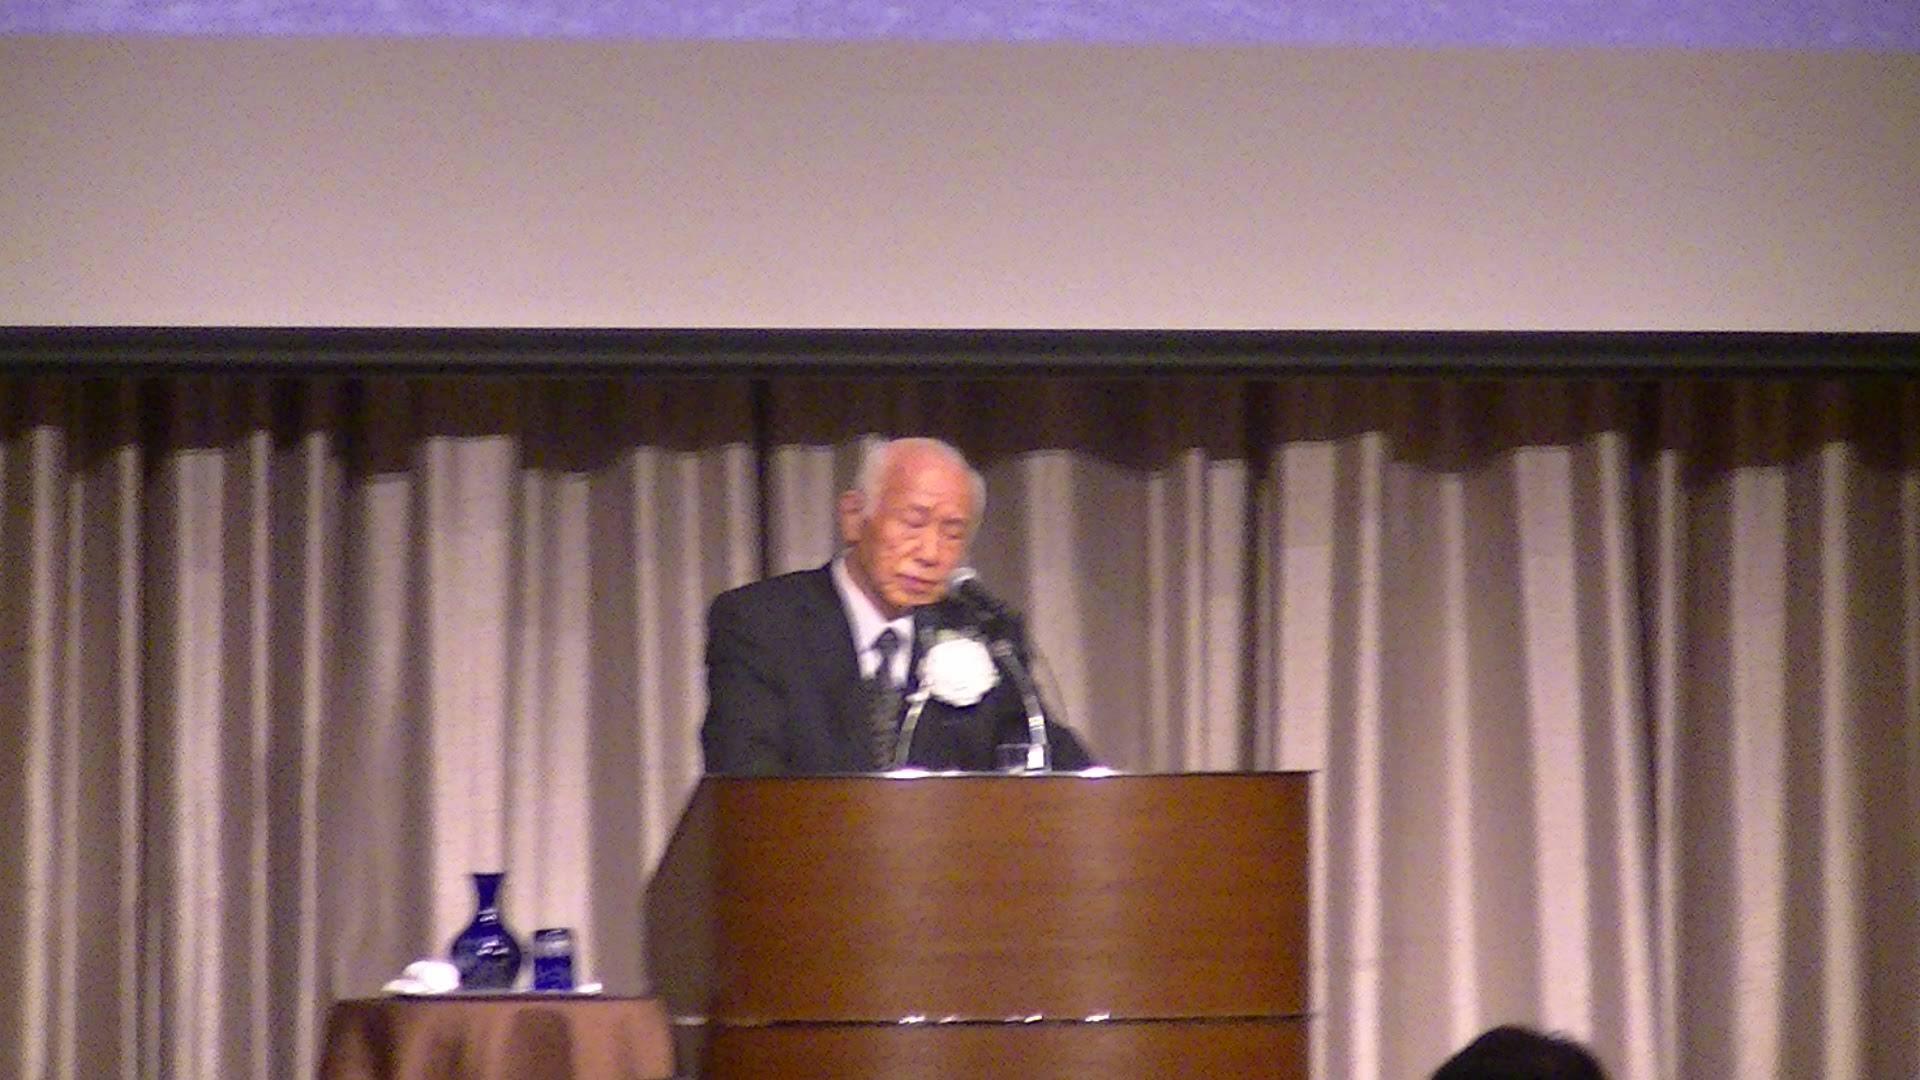 PIC 1648 1 - 思風会全国大会in広島